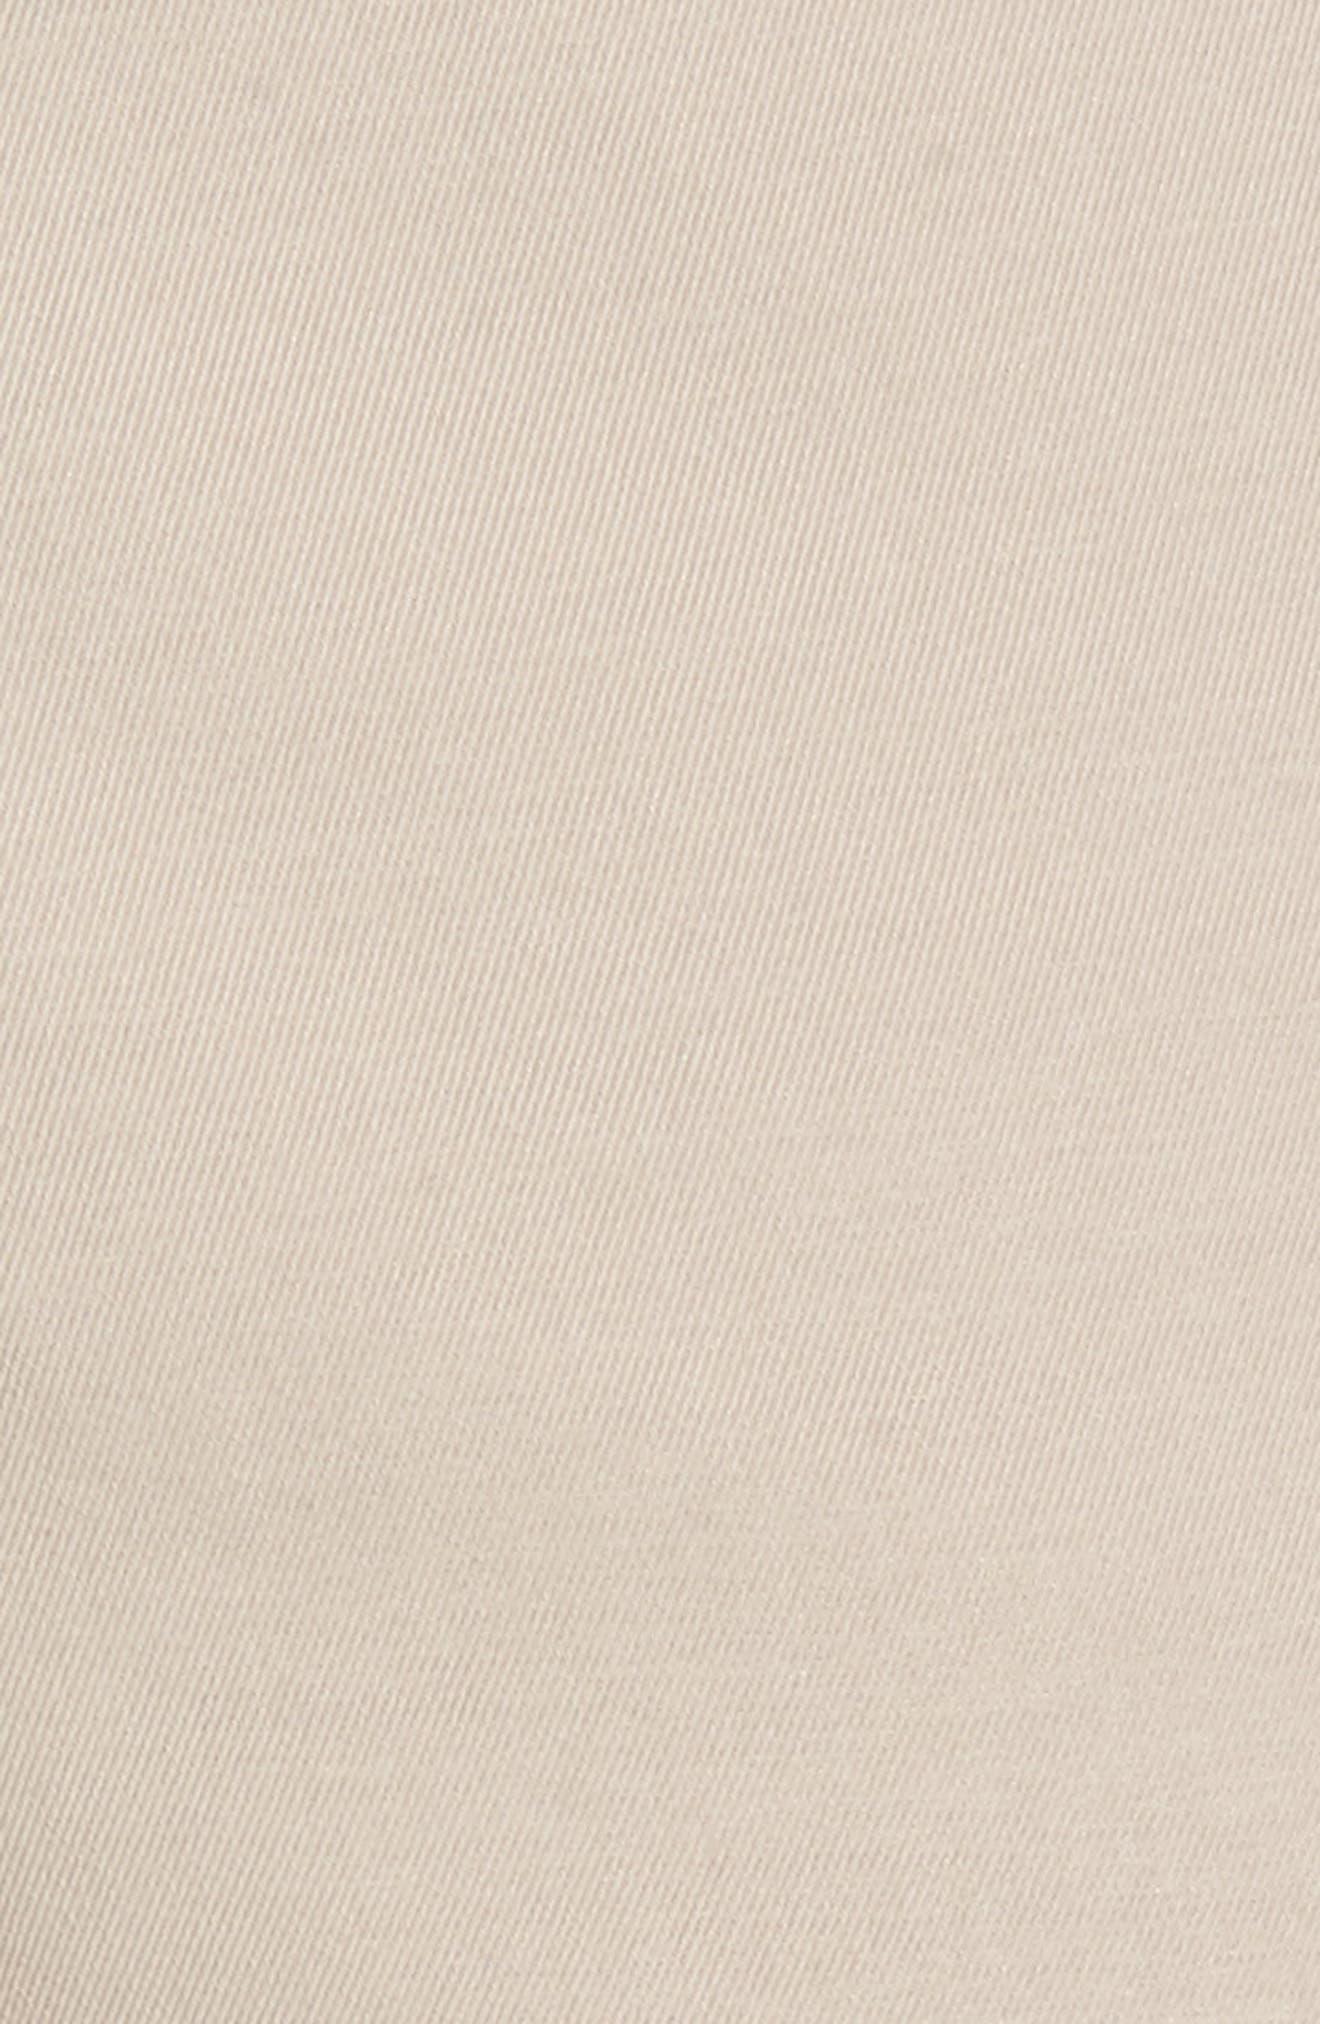 EB66 Performance Six-Pocket Pants,                             Alternate thumbnail 27, color,